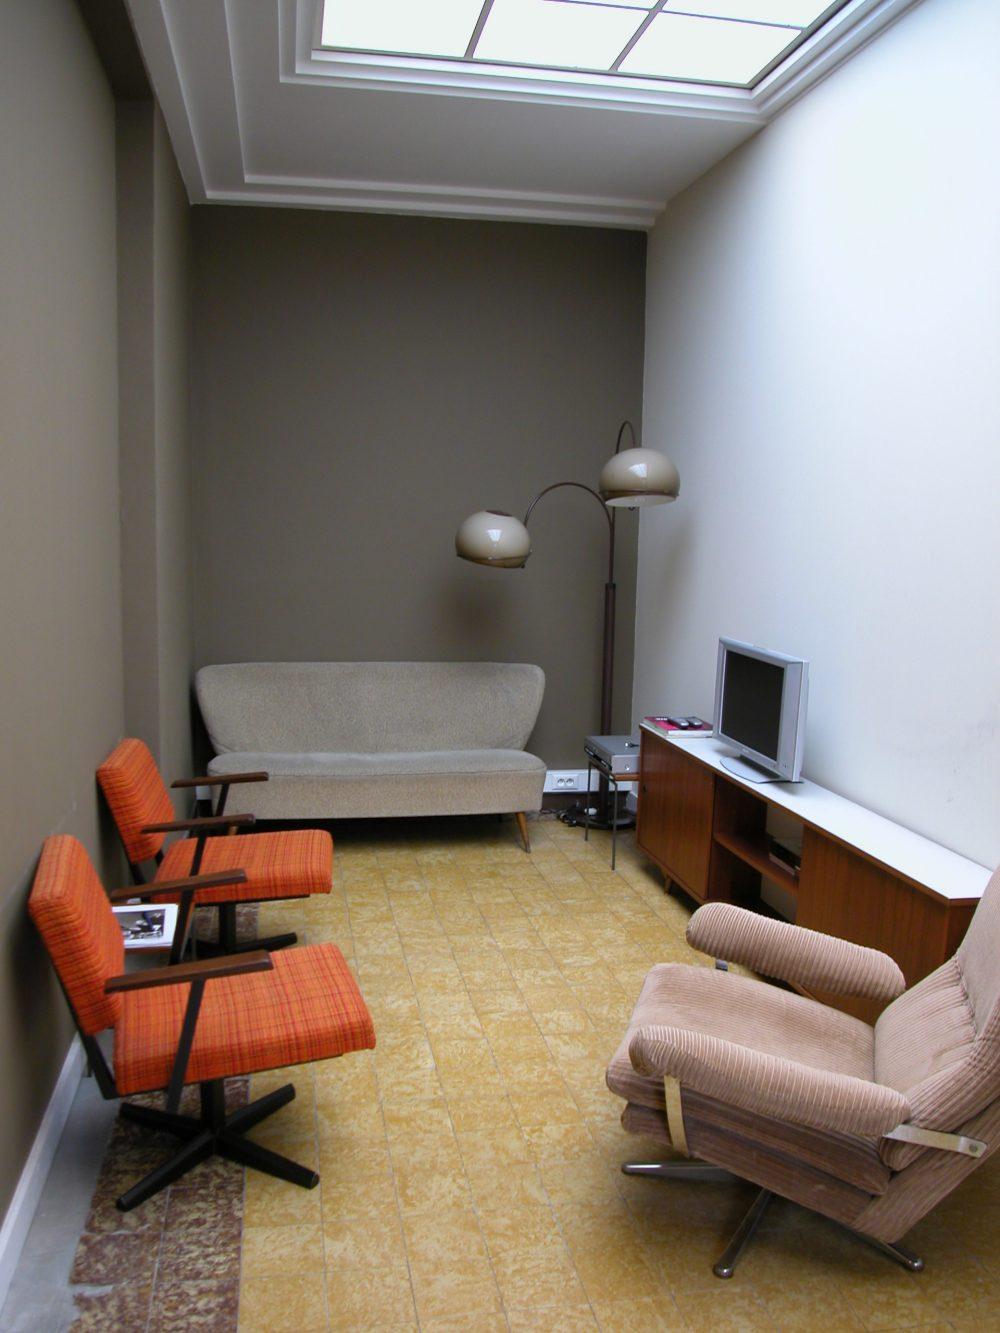 vintage furniture, warm grey walls